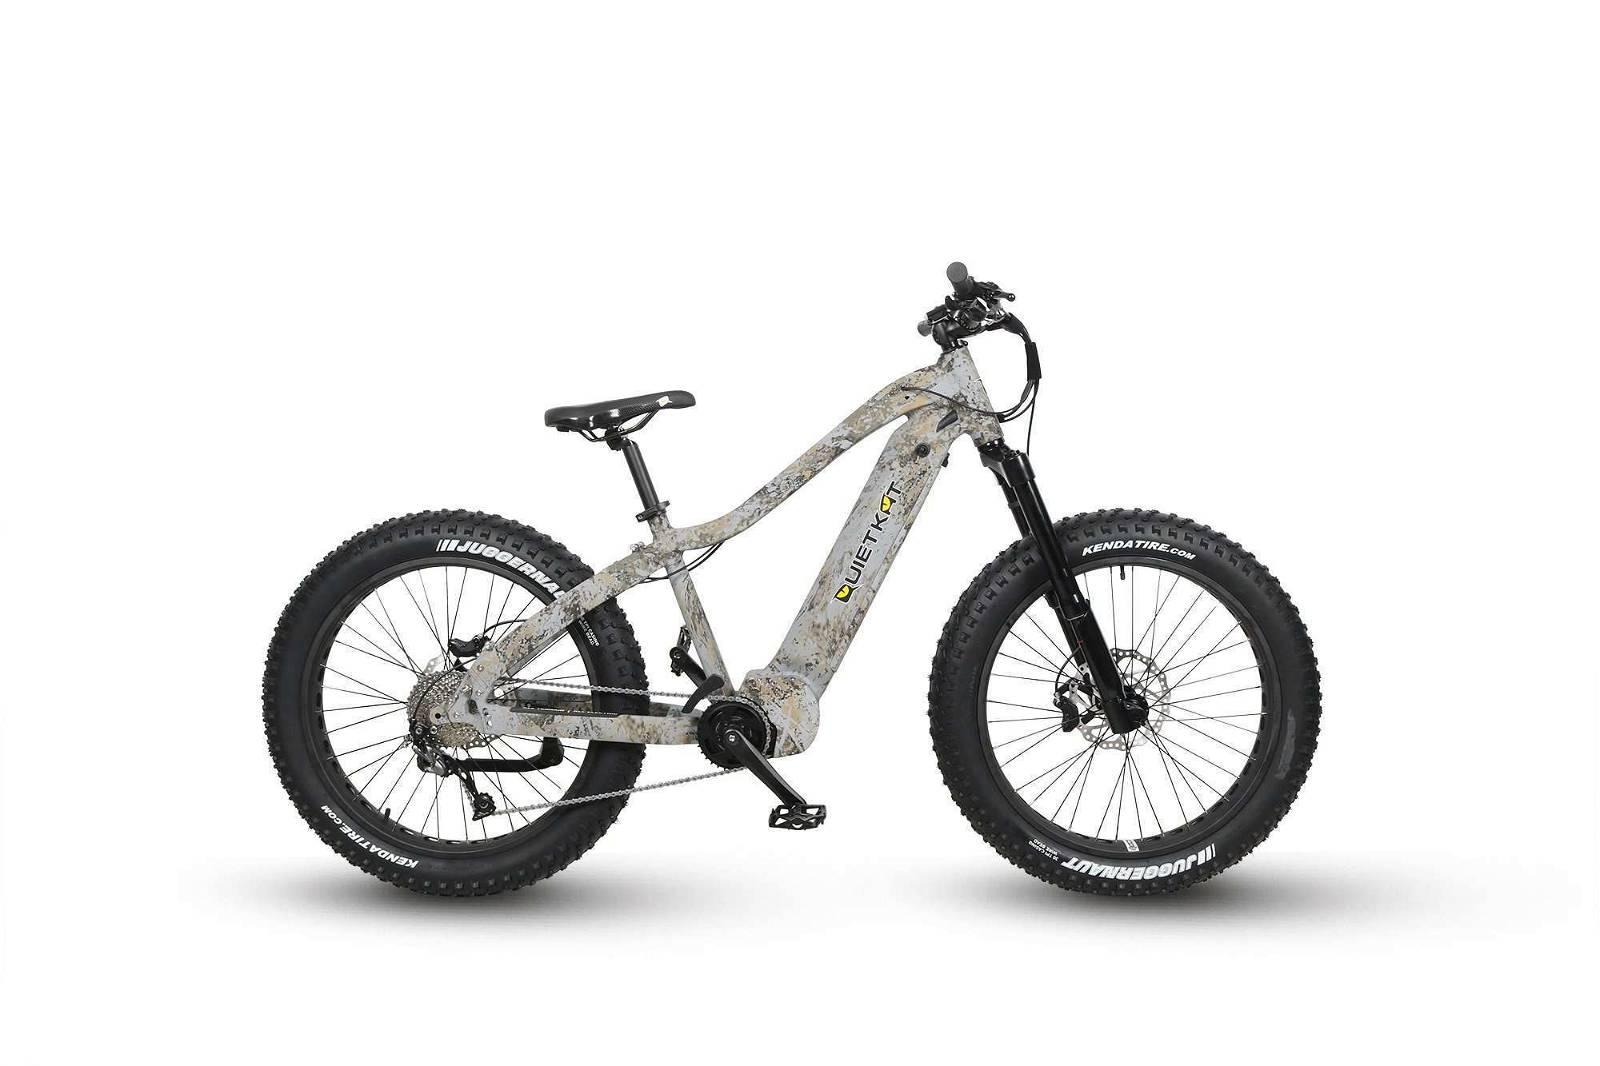 QUIETKAT Electric Hunting Bikes